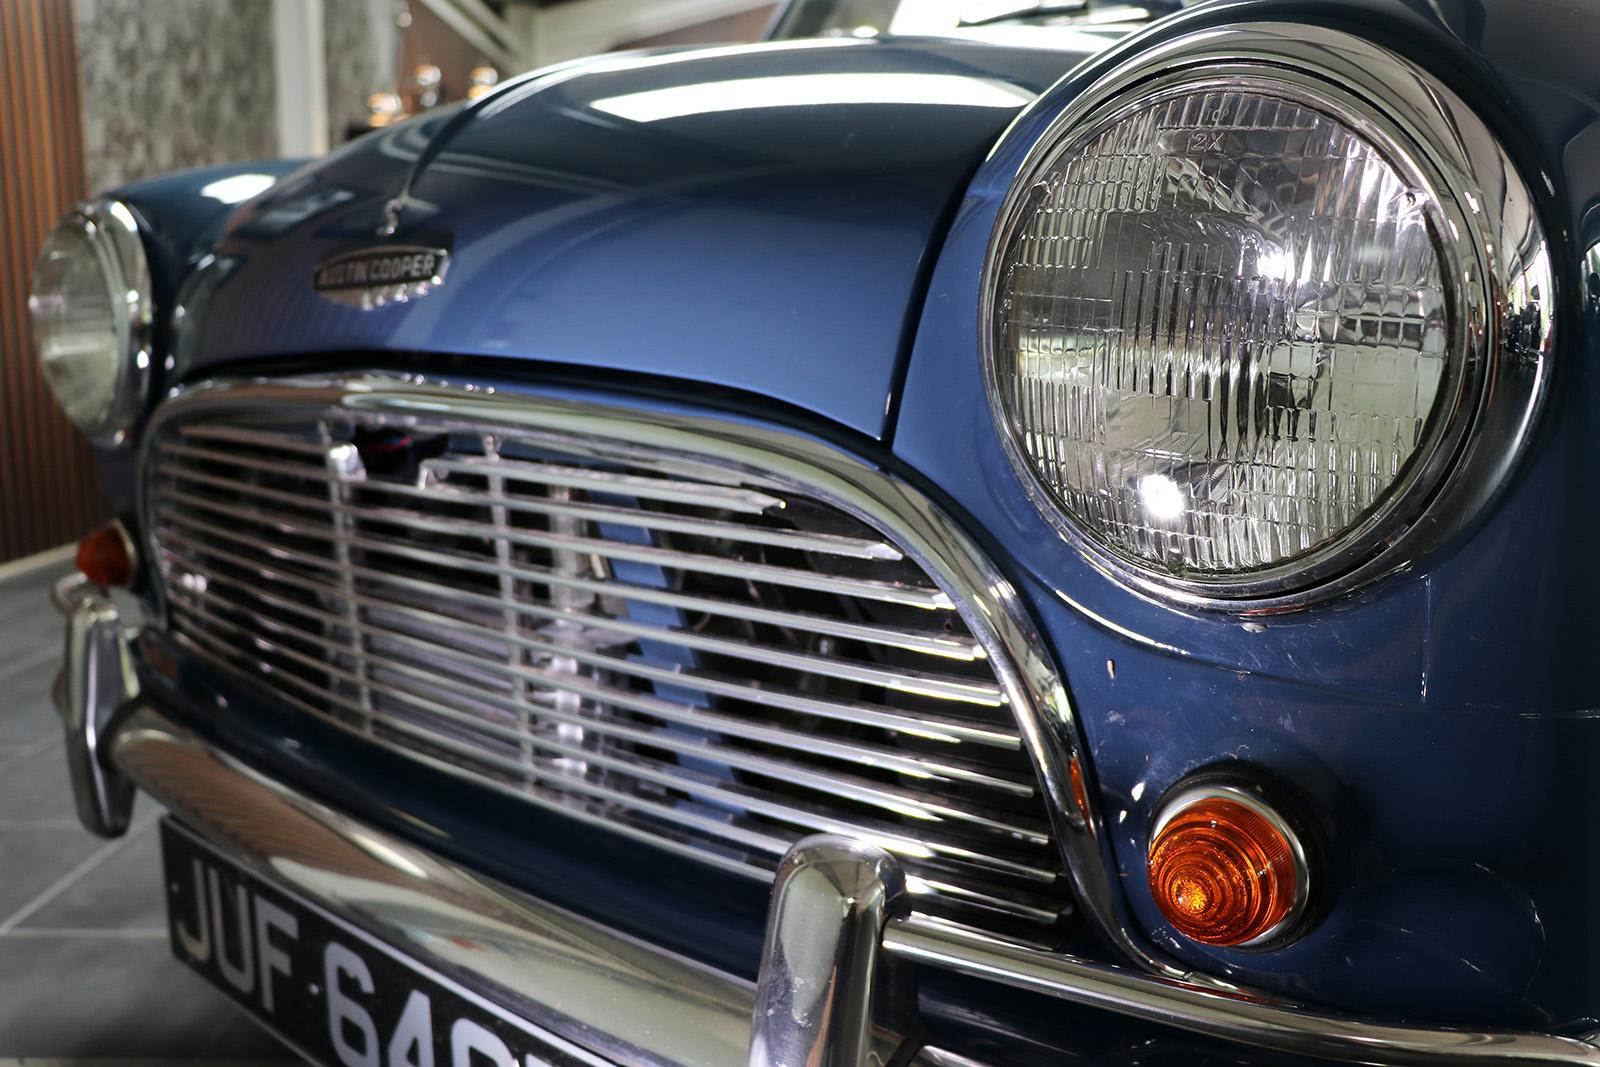 1967 blue 1275 Mini Cooper S Sayer Selection Wilkinson 4 web.jpg